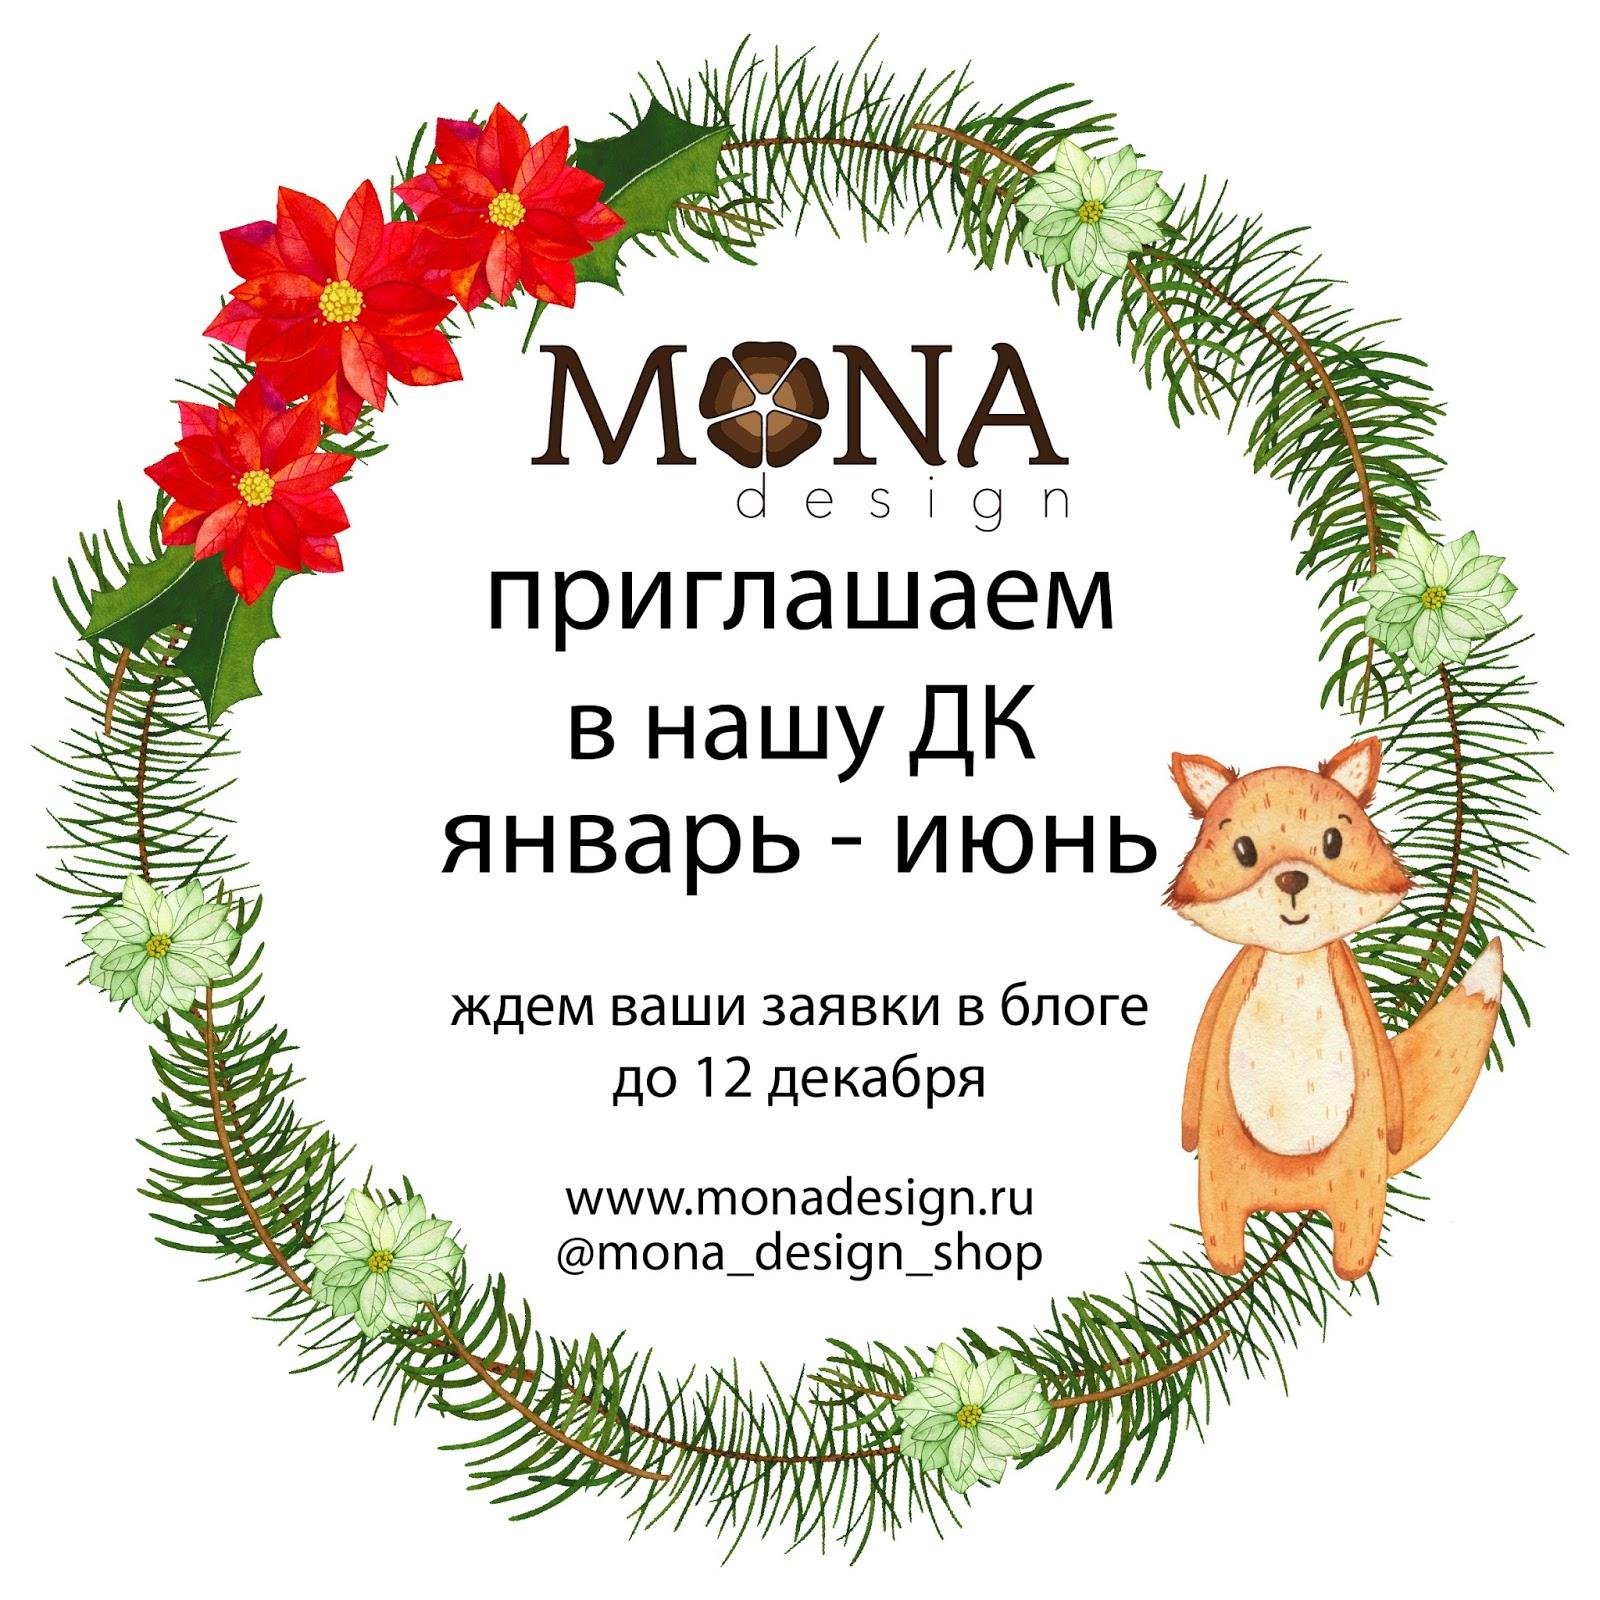 Набор в ДК Мона Дизайн